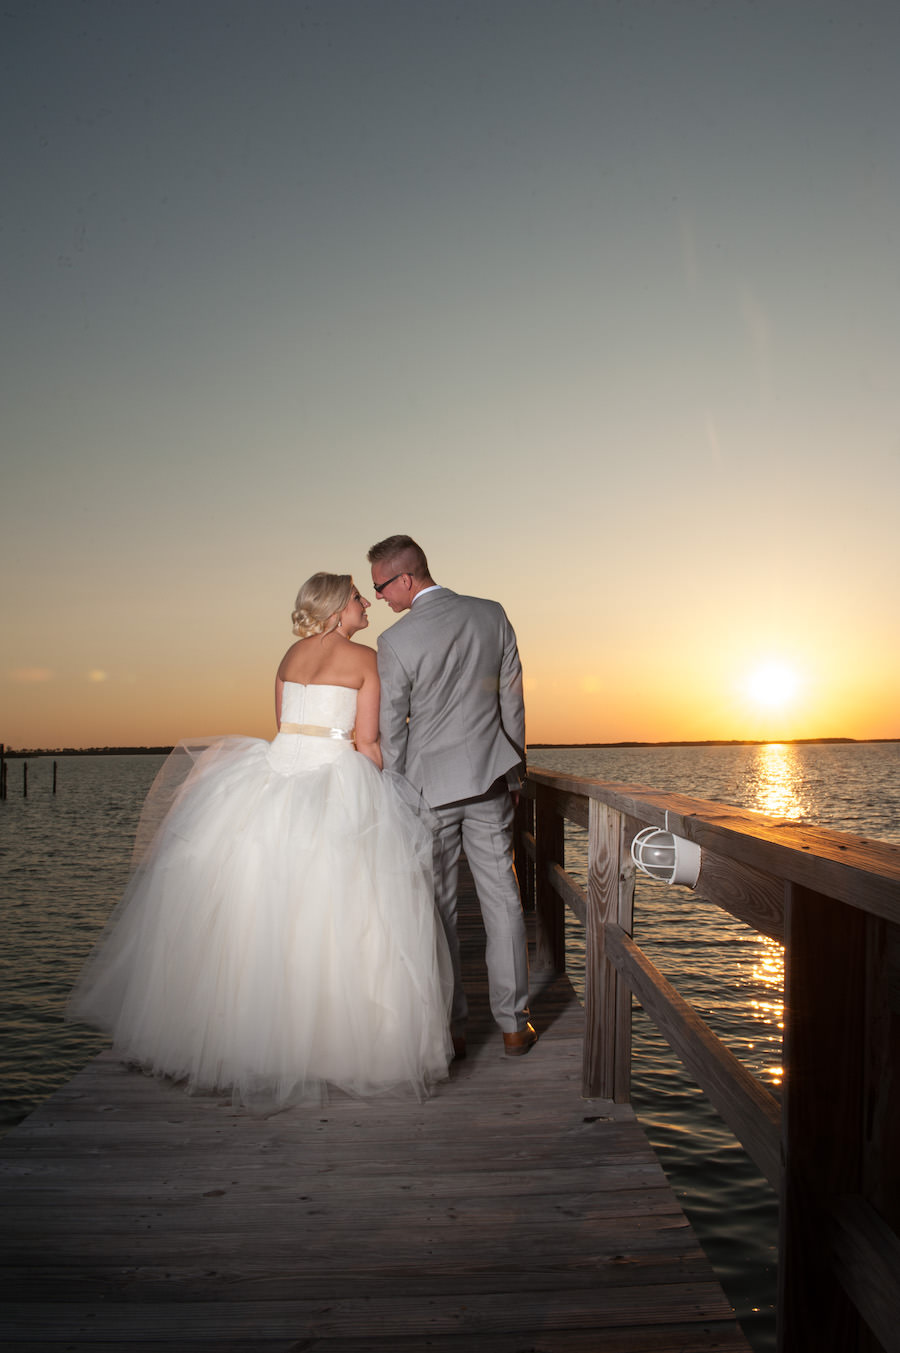 Bride and Groom Sunset Tampa Bay Wedding Portrait | Waterfront Dunedin Wedding Venue Beso del Sol